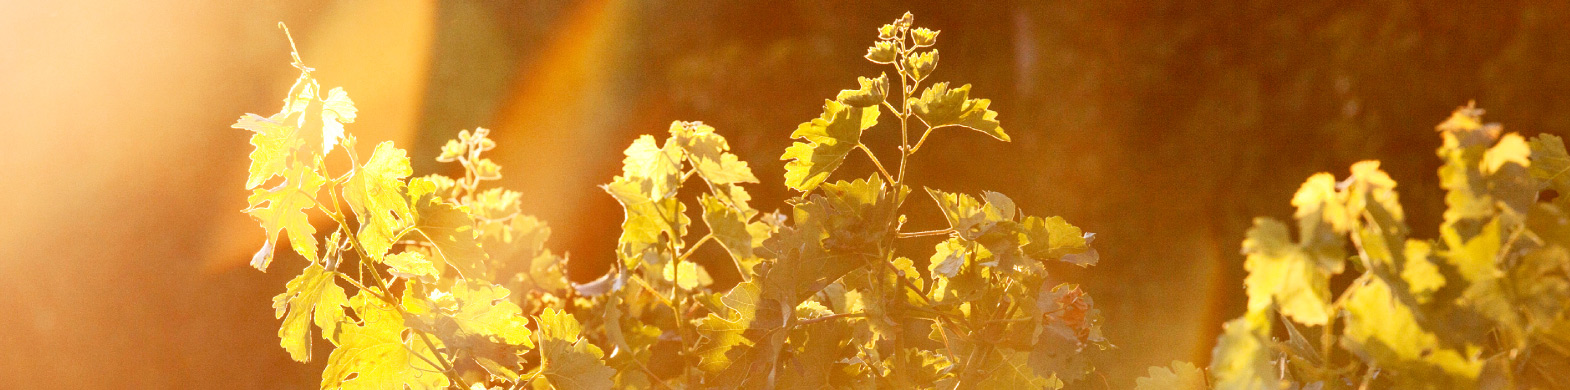 Mast-Vineyard-SoriBricco